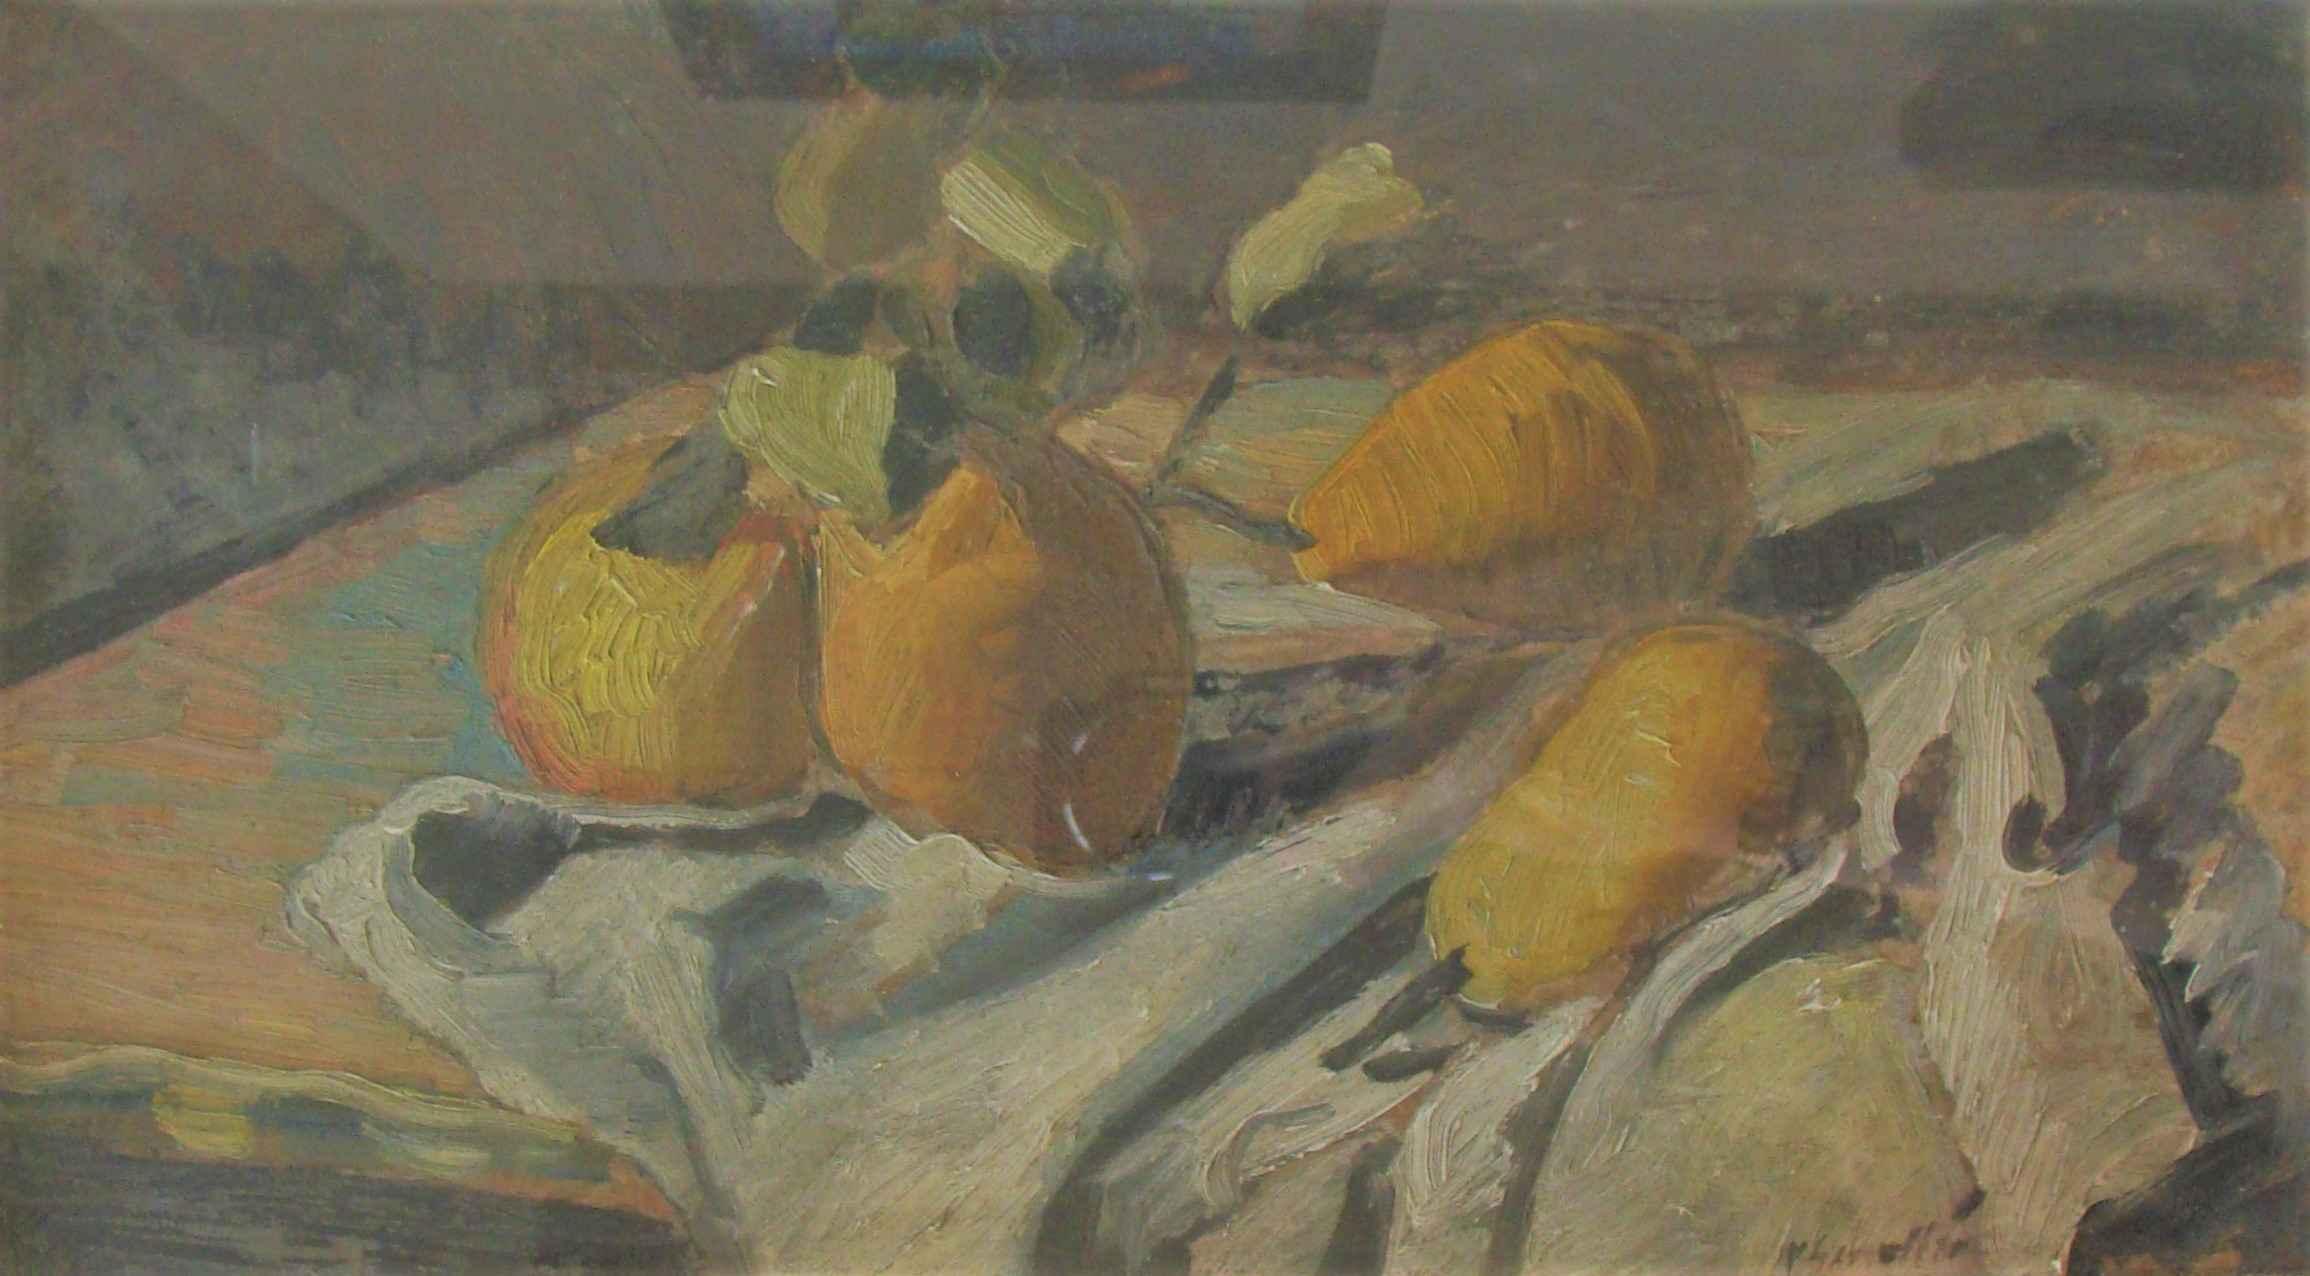 Still Life with Pears by Mr. Robert Schellin - Masterpiece Online